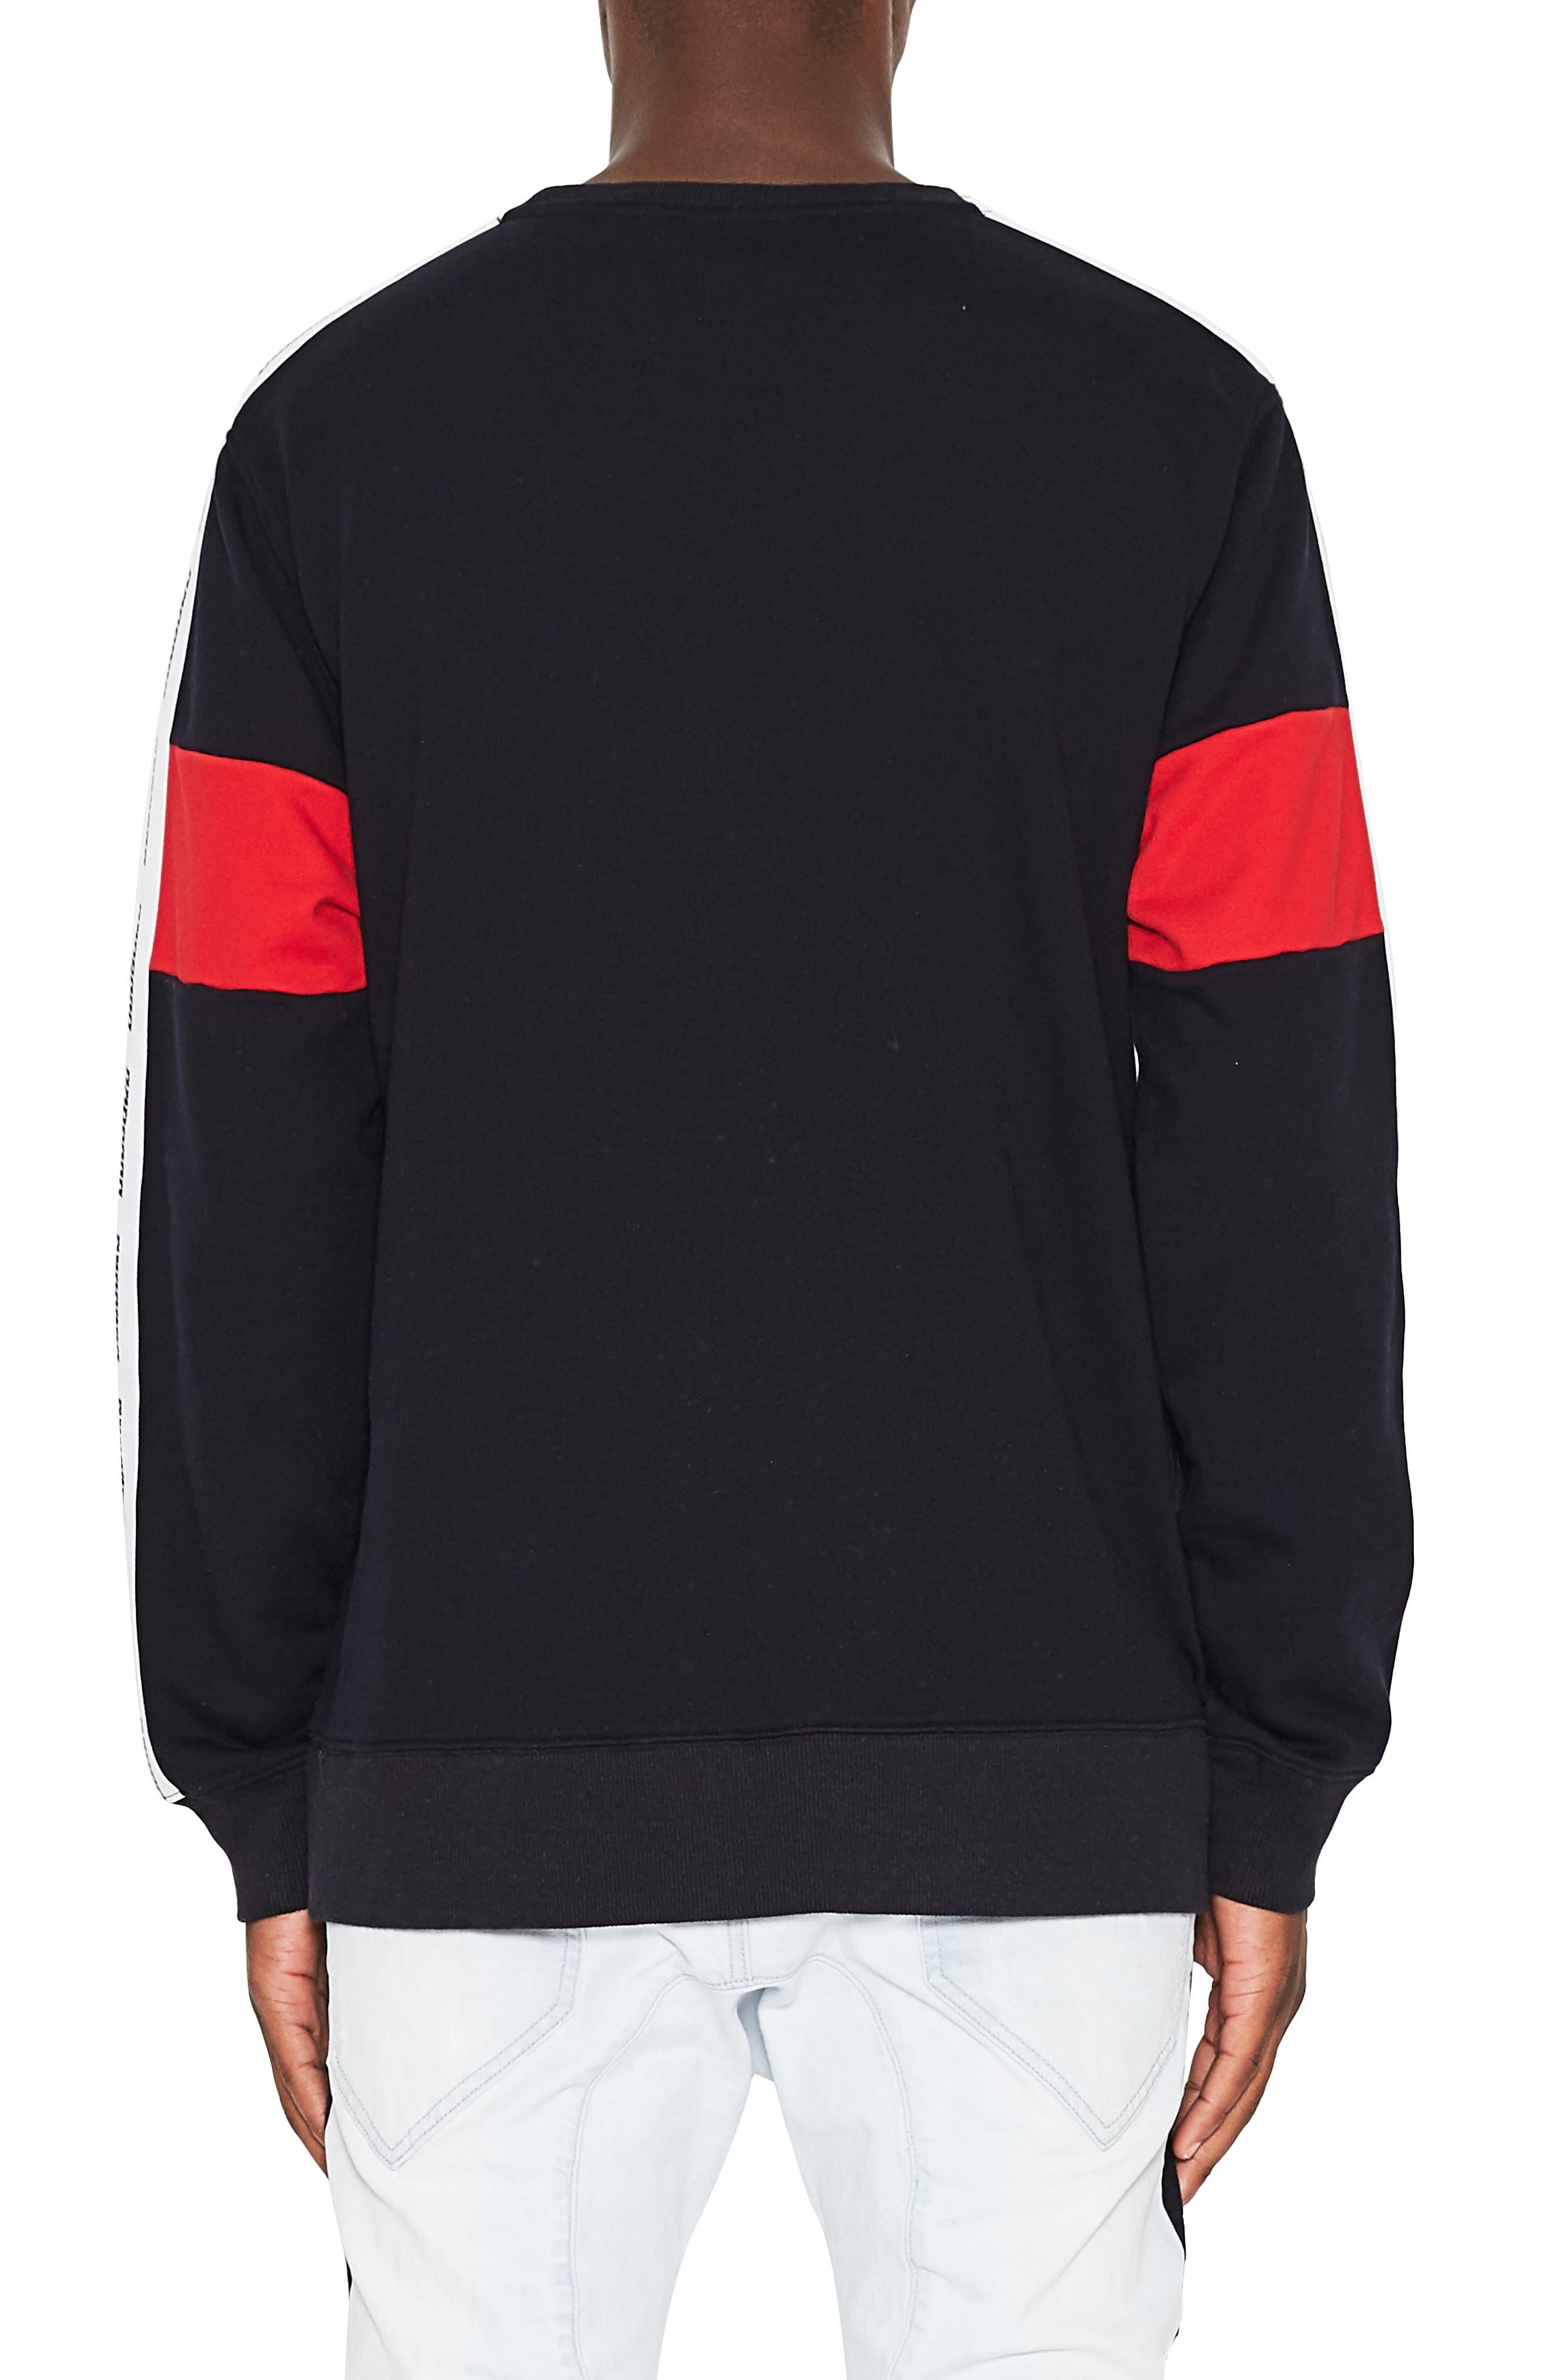 Dragon Crewneck Sweatshirt,                             Alternate thumbnail 2, color,                             GRAPHITE